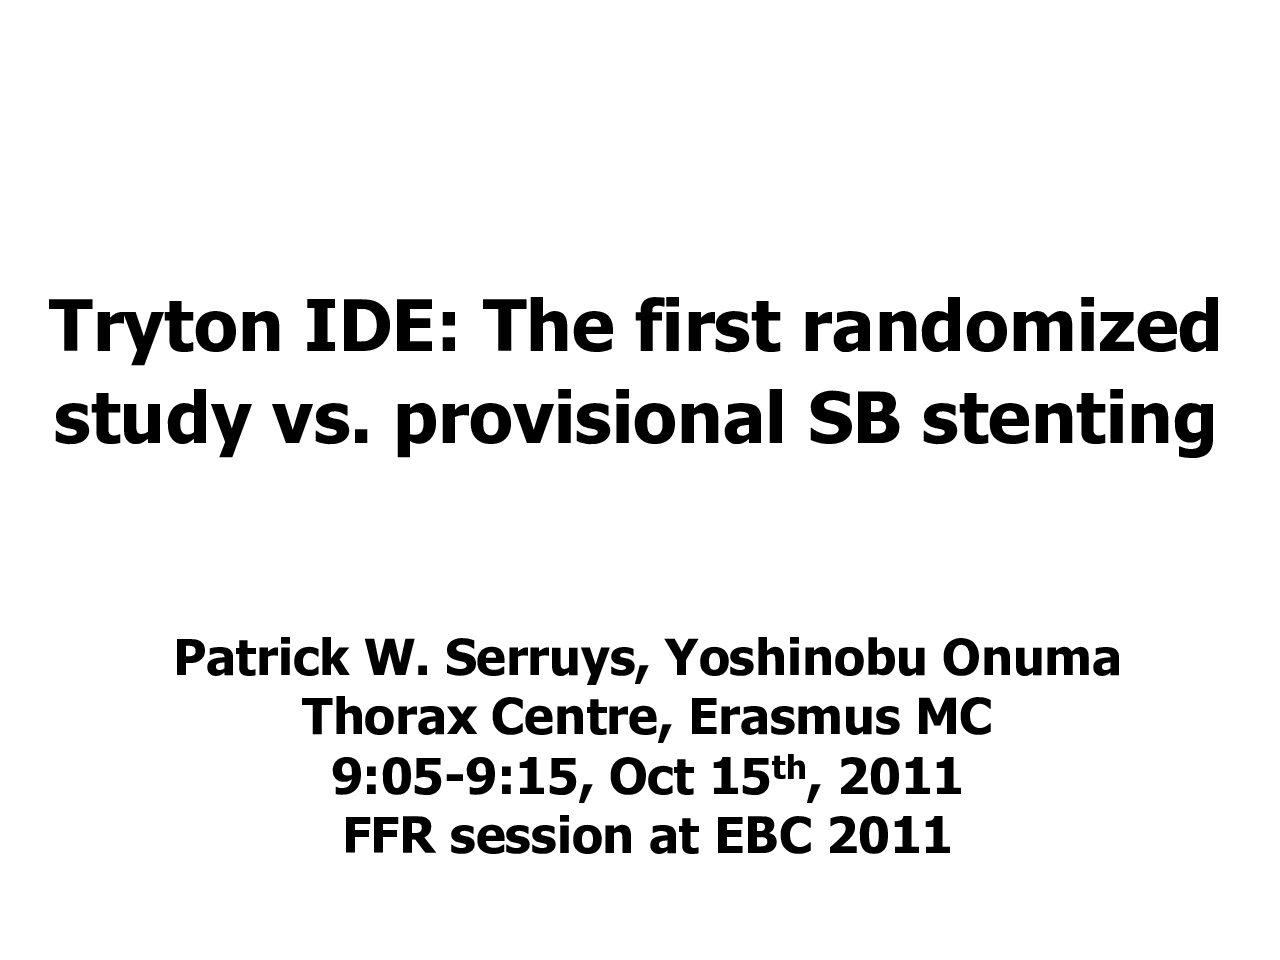 Tryton IDE: The first randomized study vs. provisional SB stenting